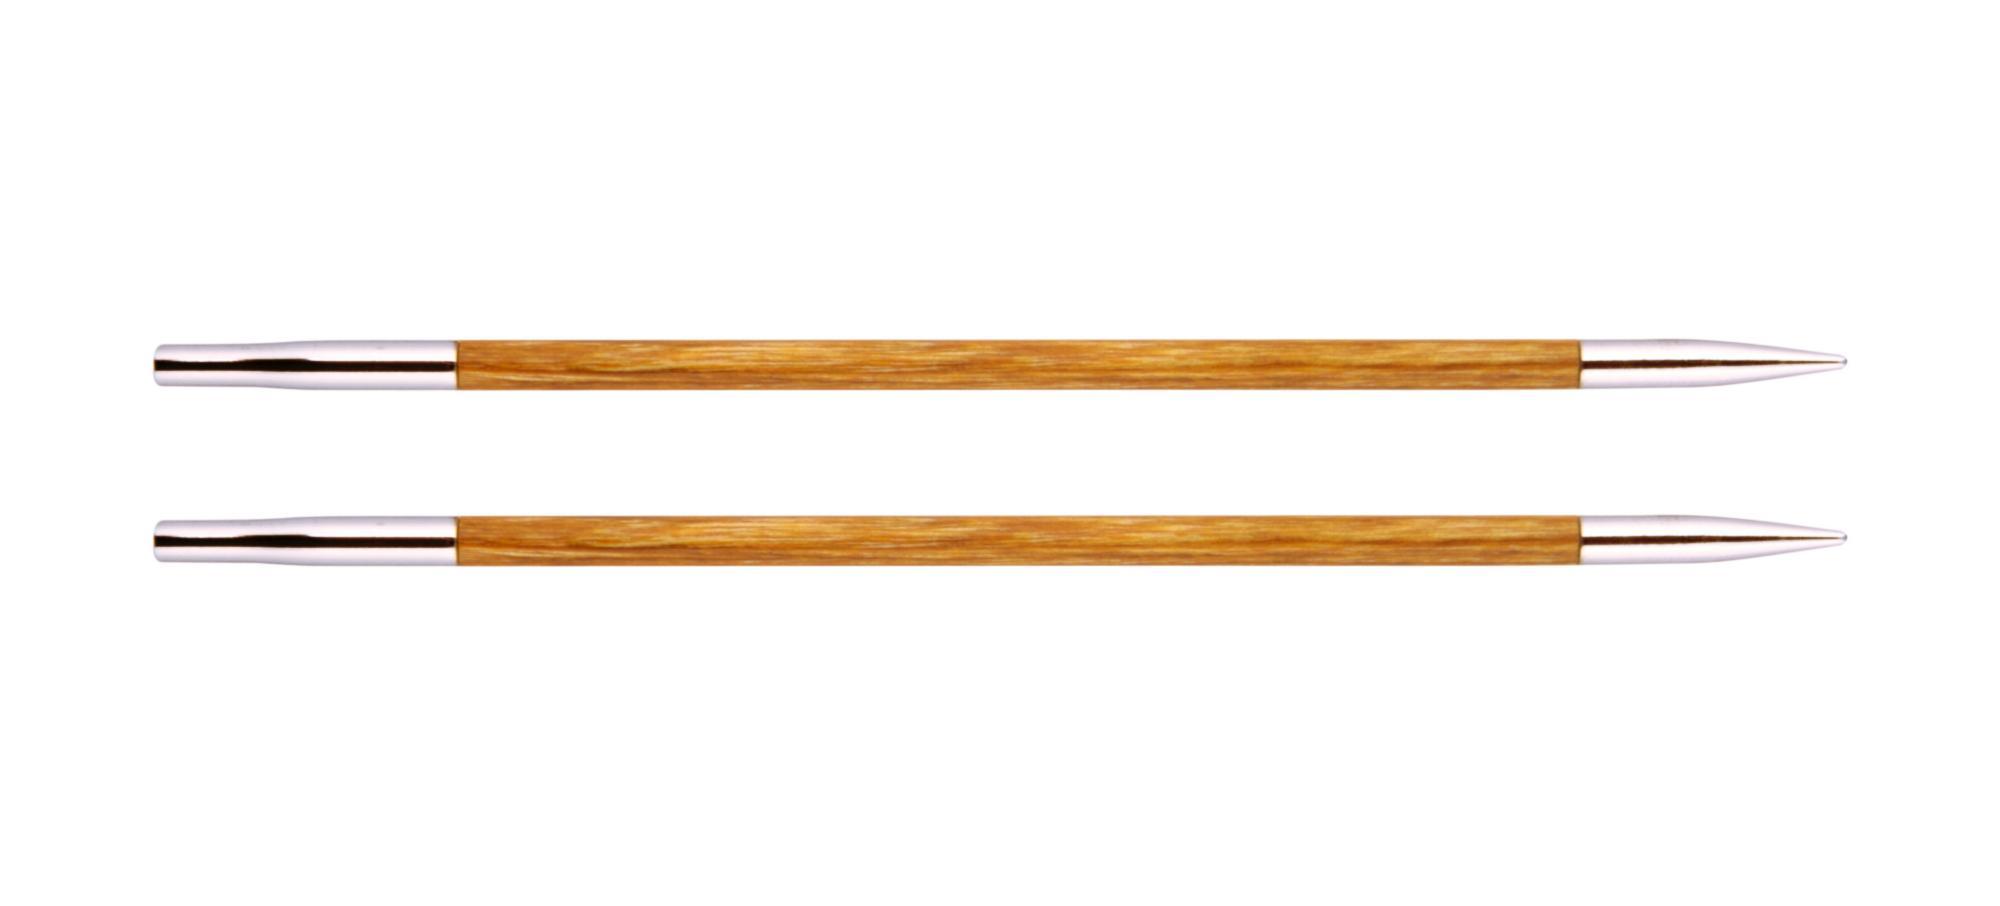 Спицы съемные Royale KnitPro, 29254, 3.75 мм